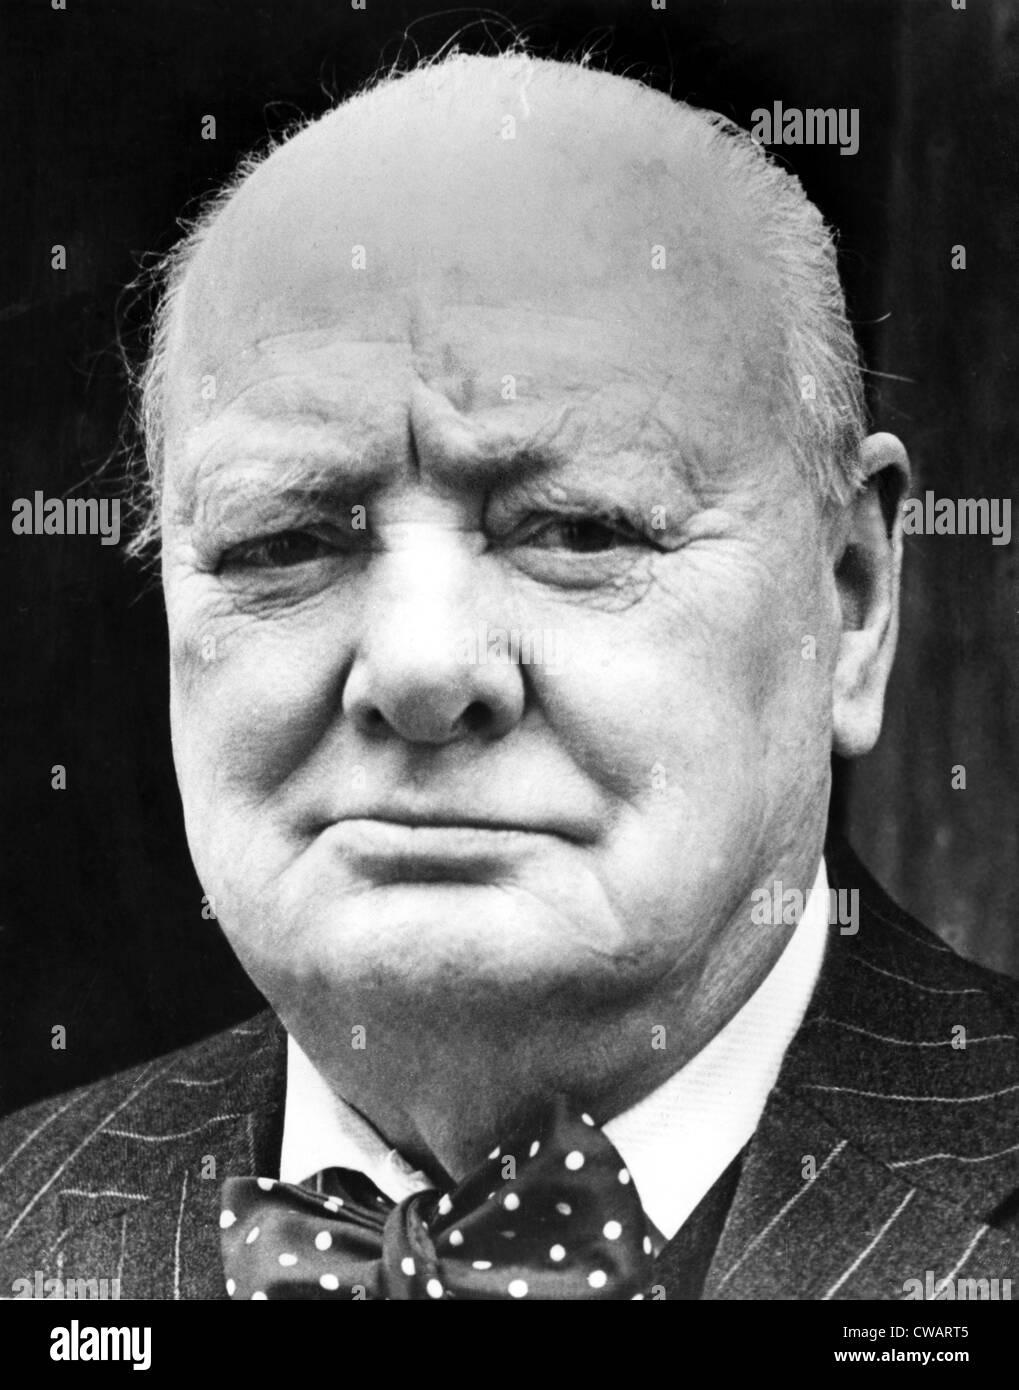 Winston Churchill (1874-1965), Primer Ministro británico y Premio Nobel de Literatura de 1953. Al ser devuelto al Foto de stock